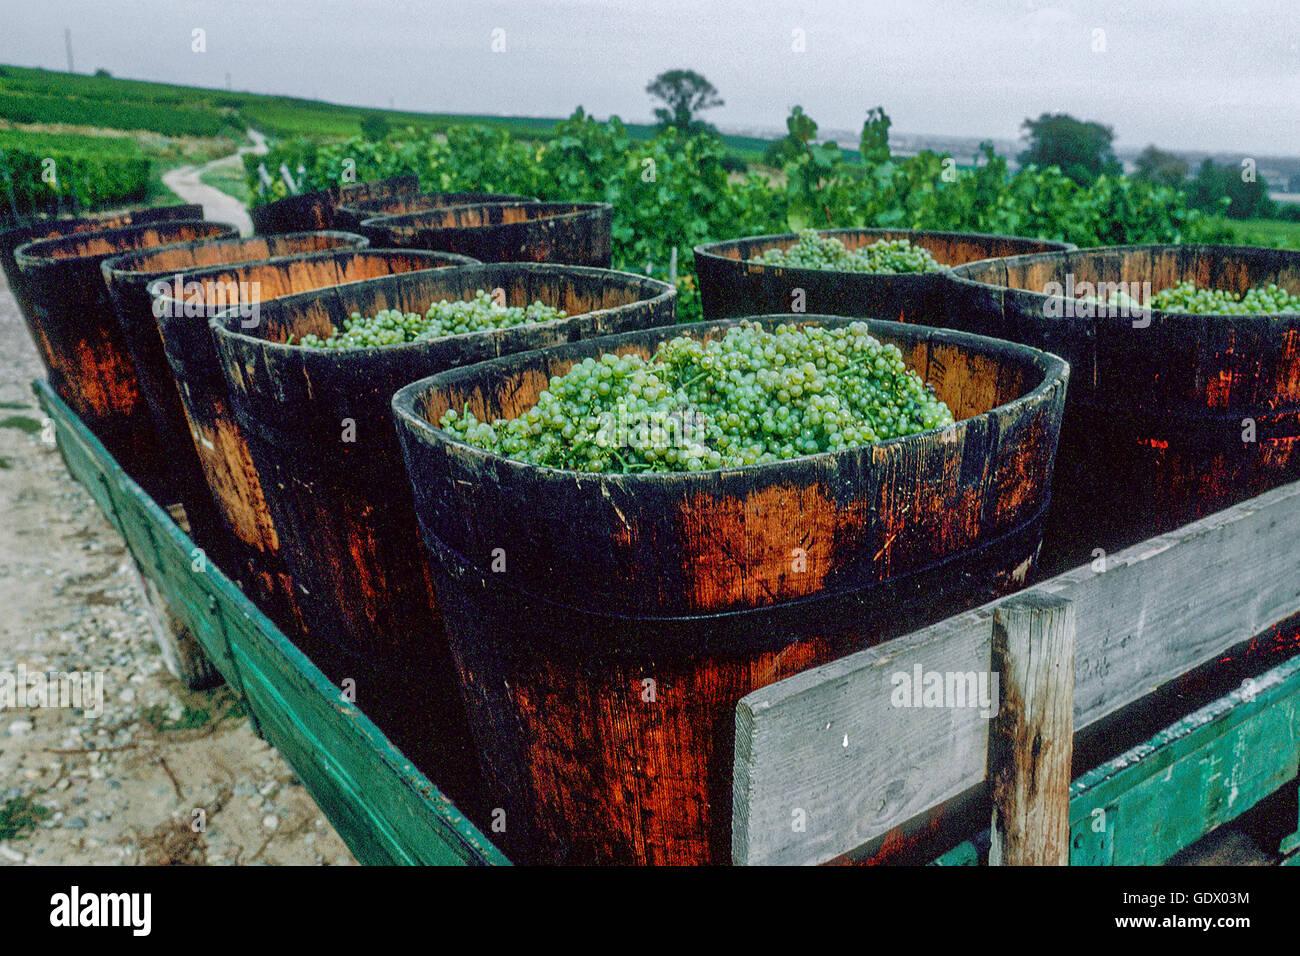 harvest in Alsace, France - Stock Image